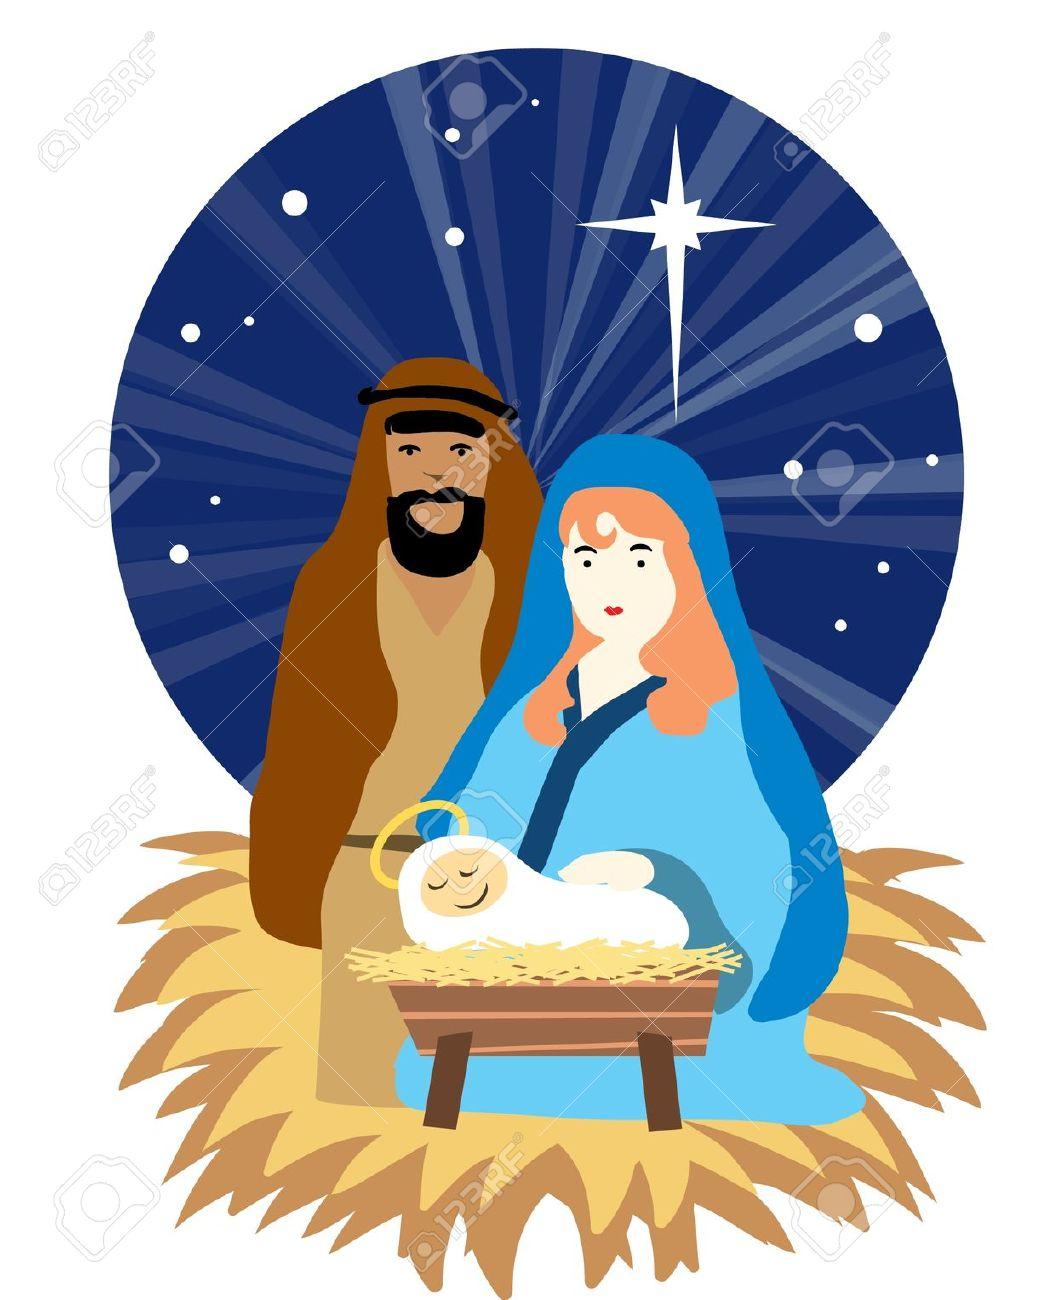 Christmas Scenes Jesus Clipart.